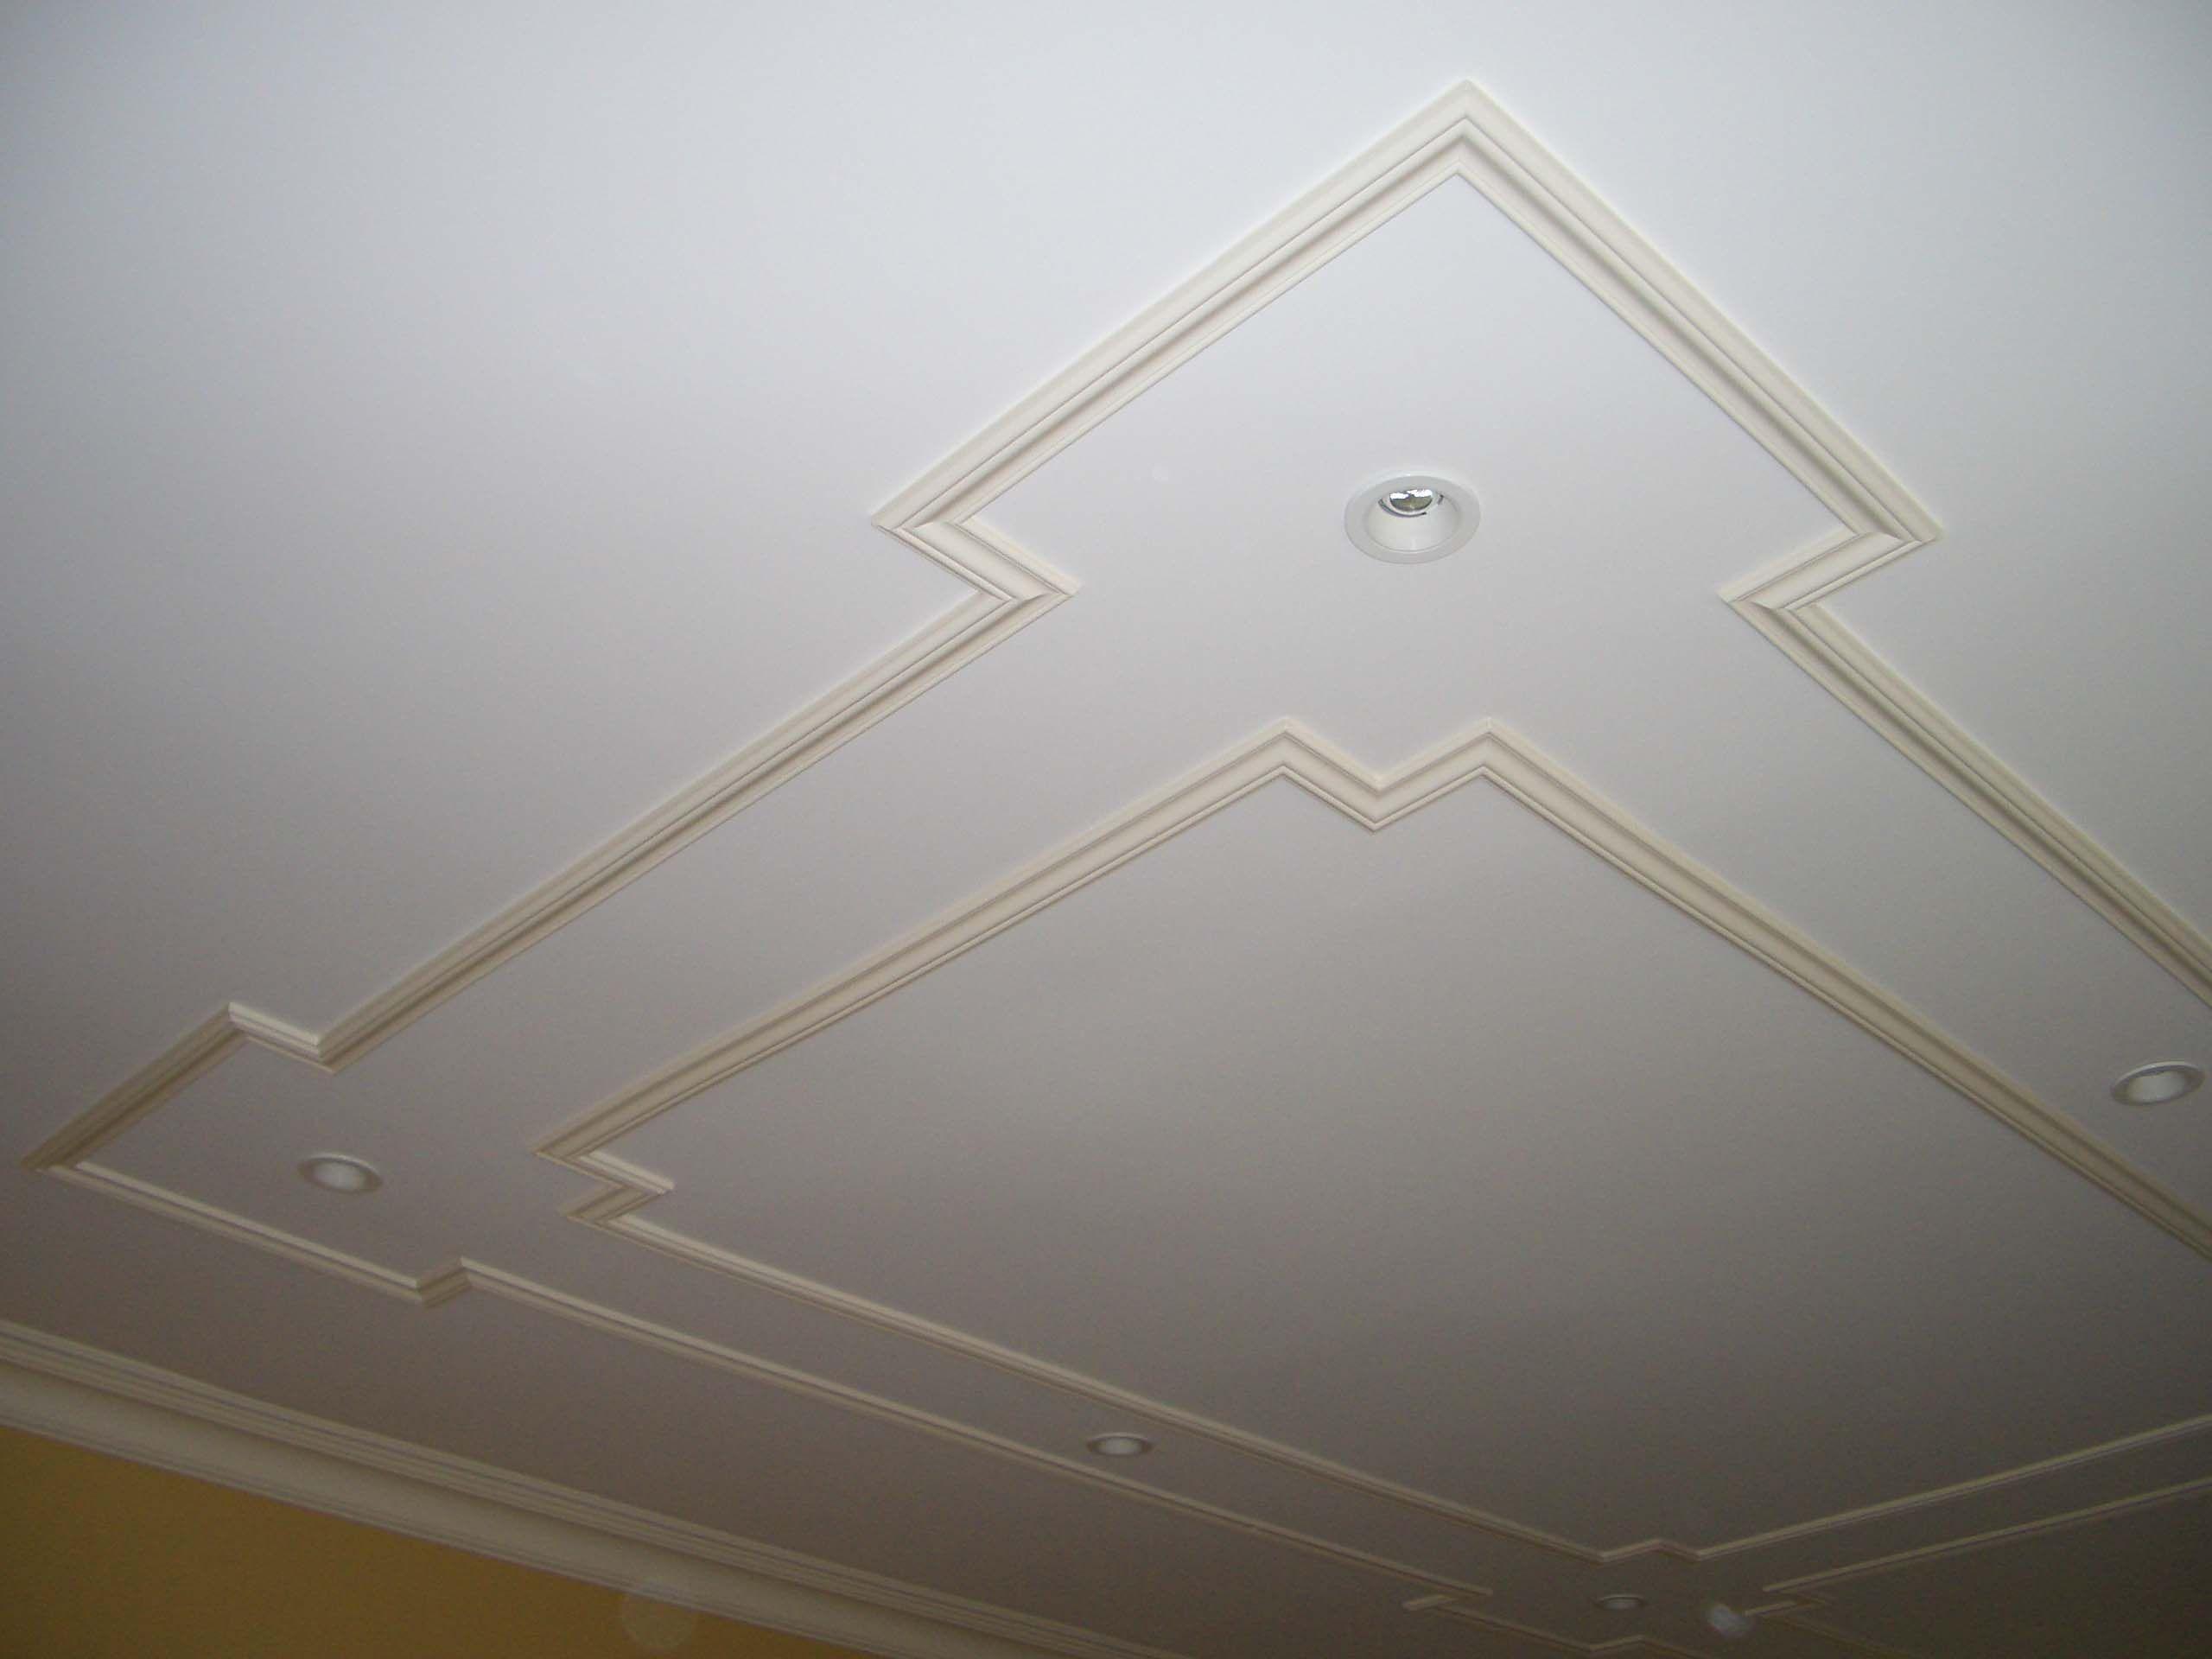 Applied Molding Ceilings Ceiling Moldings Trim Plaster Ceiling Design Coffered Ceiling Design Simple Ceiling Design